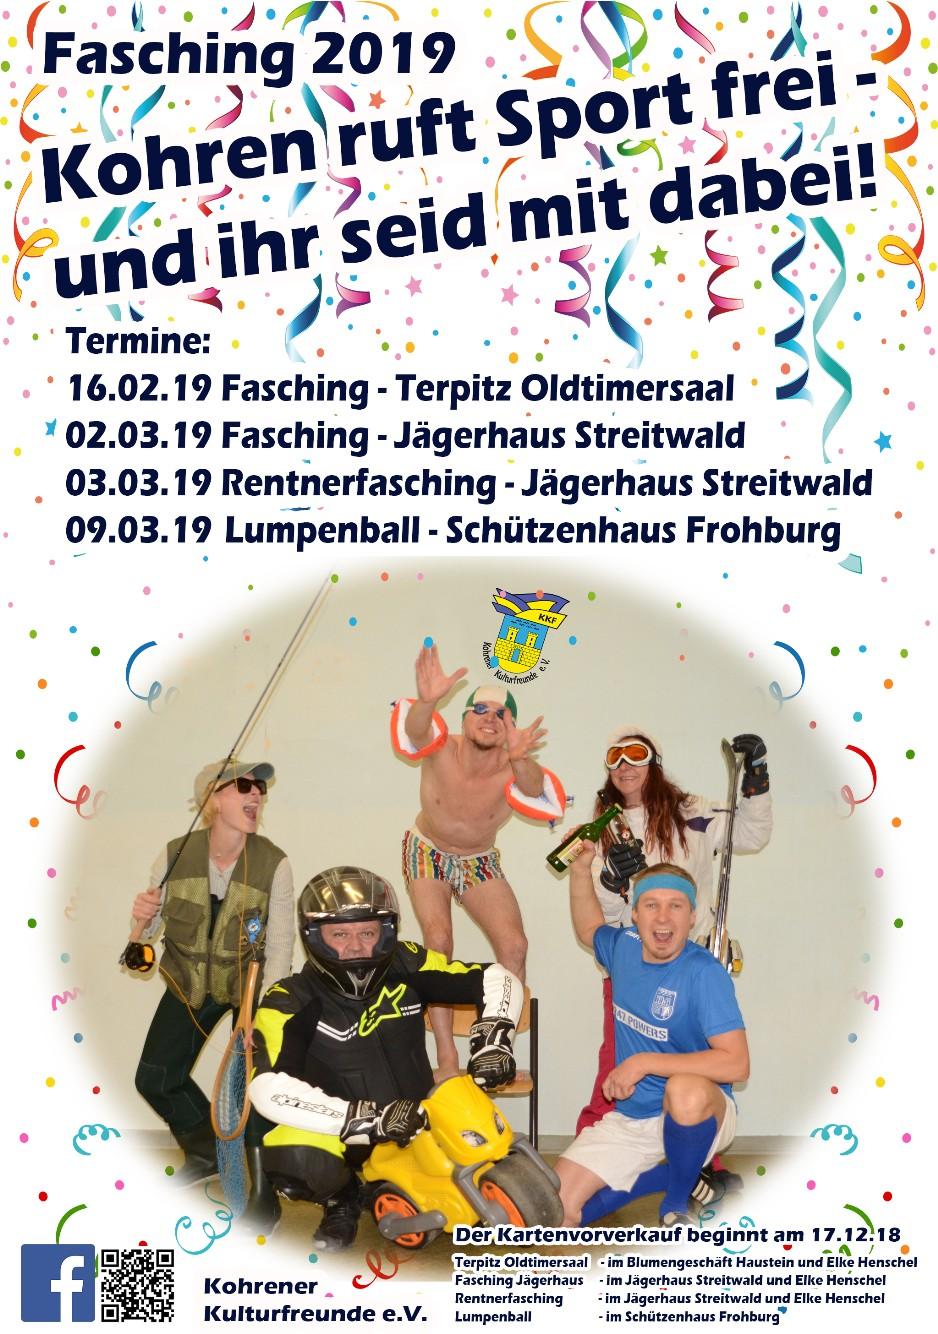 Fasching 2019 Kohrener Kulturfreunde E V